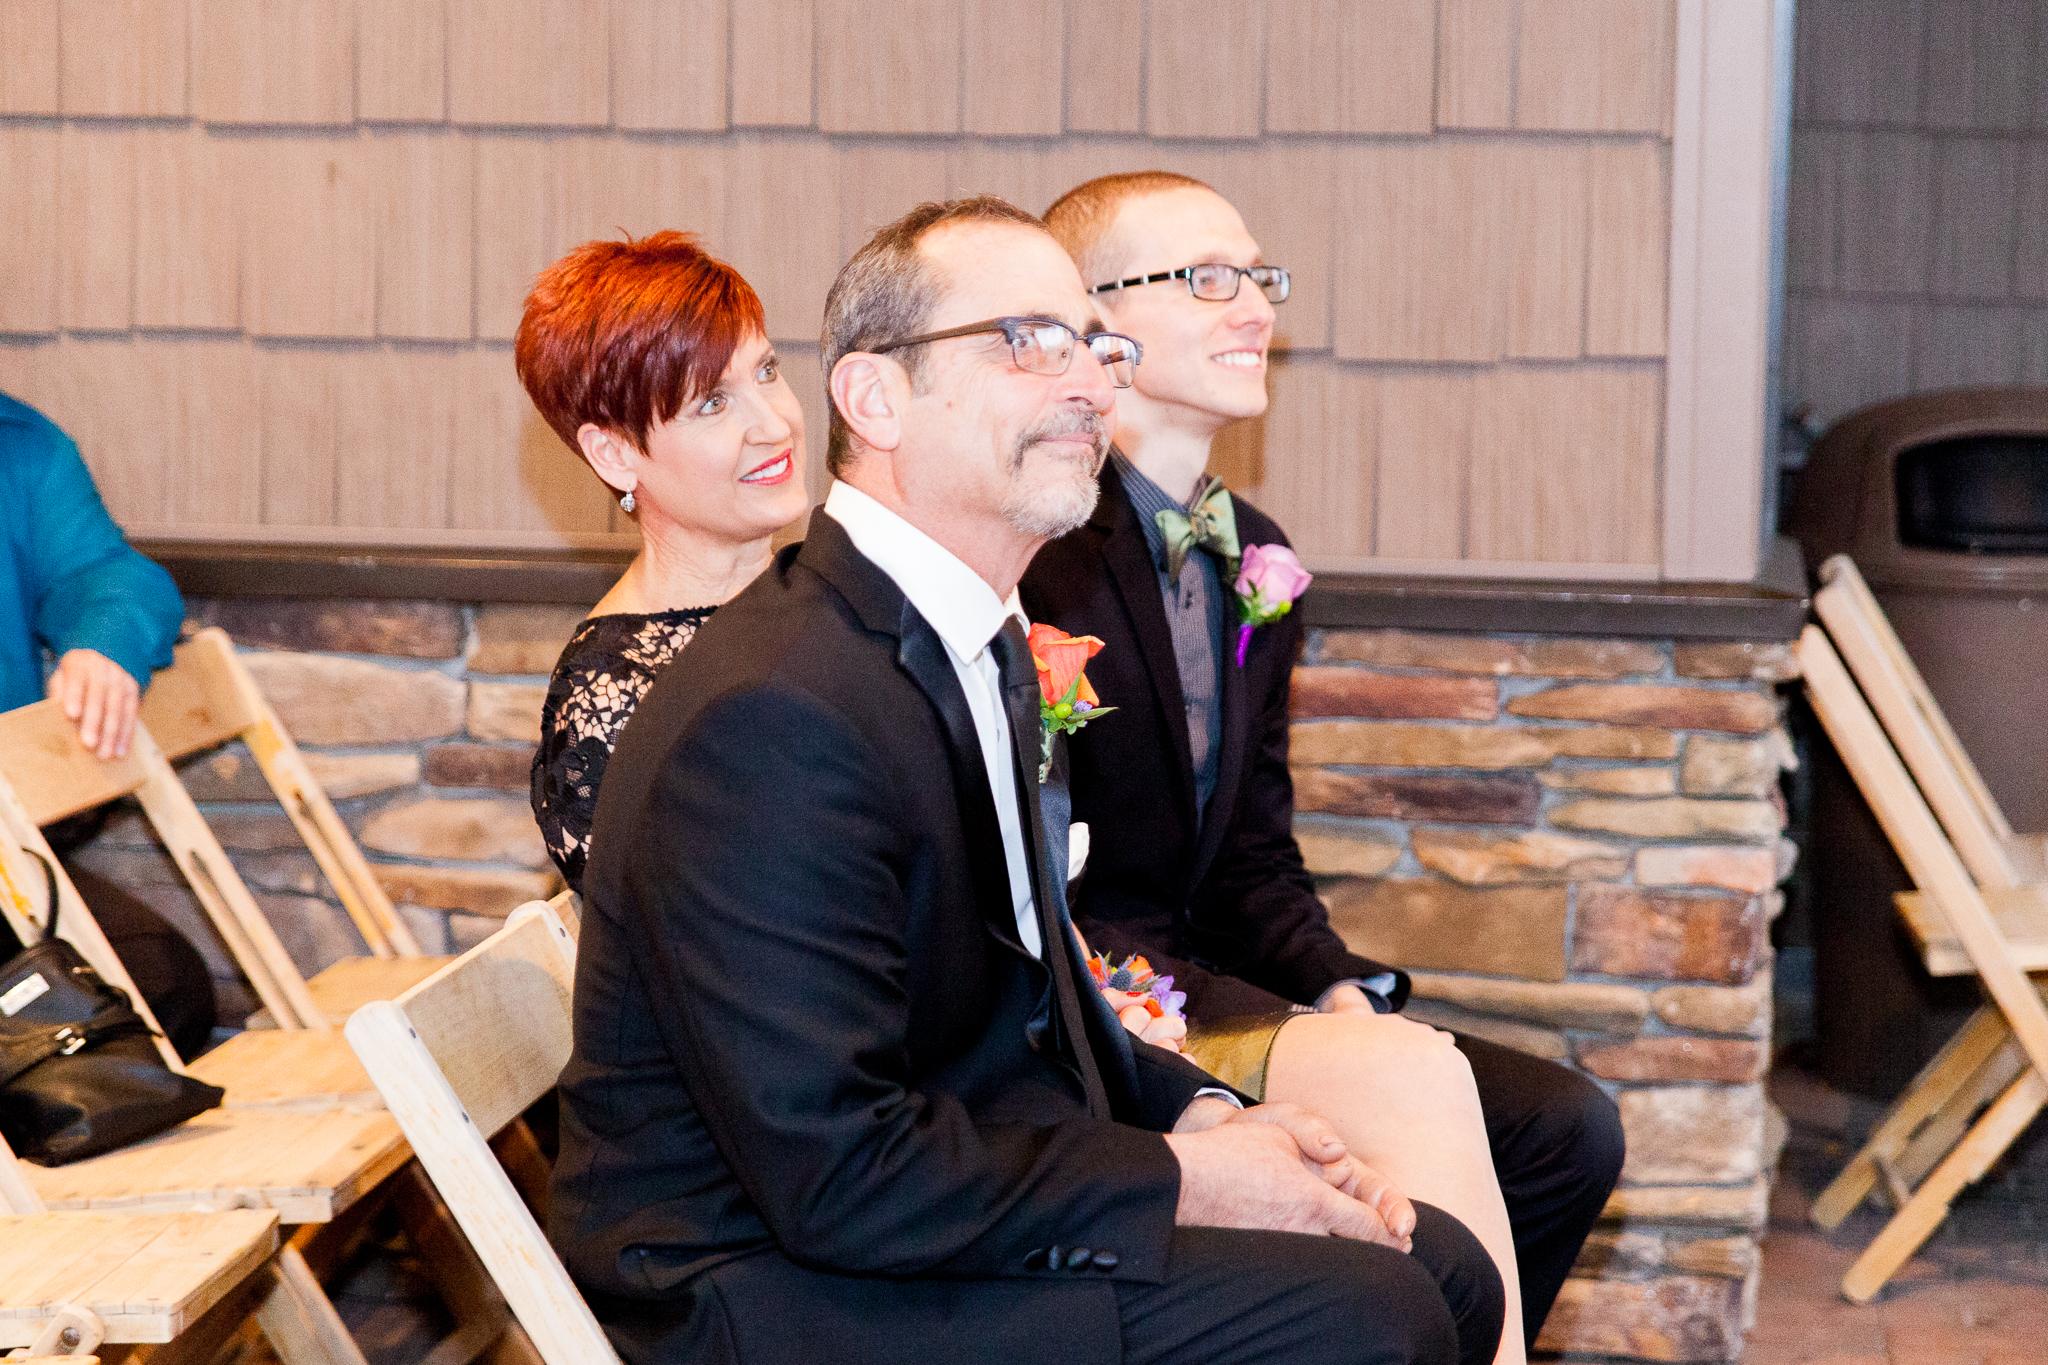 camuglia-whomstudio-chelsea_and_andy-nycphotographer-wedding-brooklyn-buffalo-timberlodge-077-0588.jpg